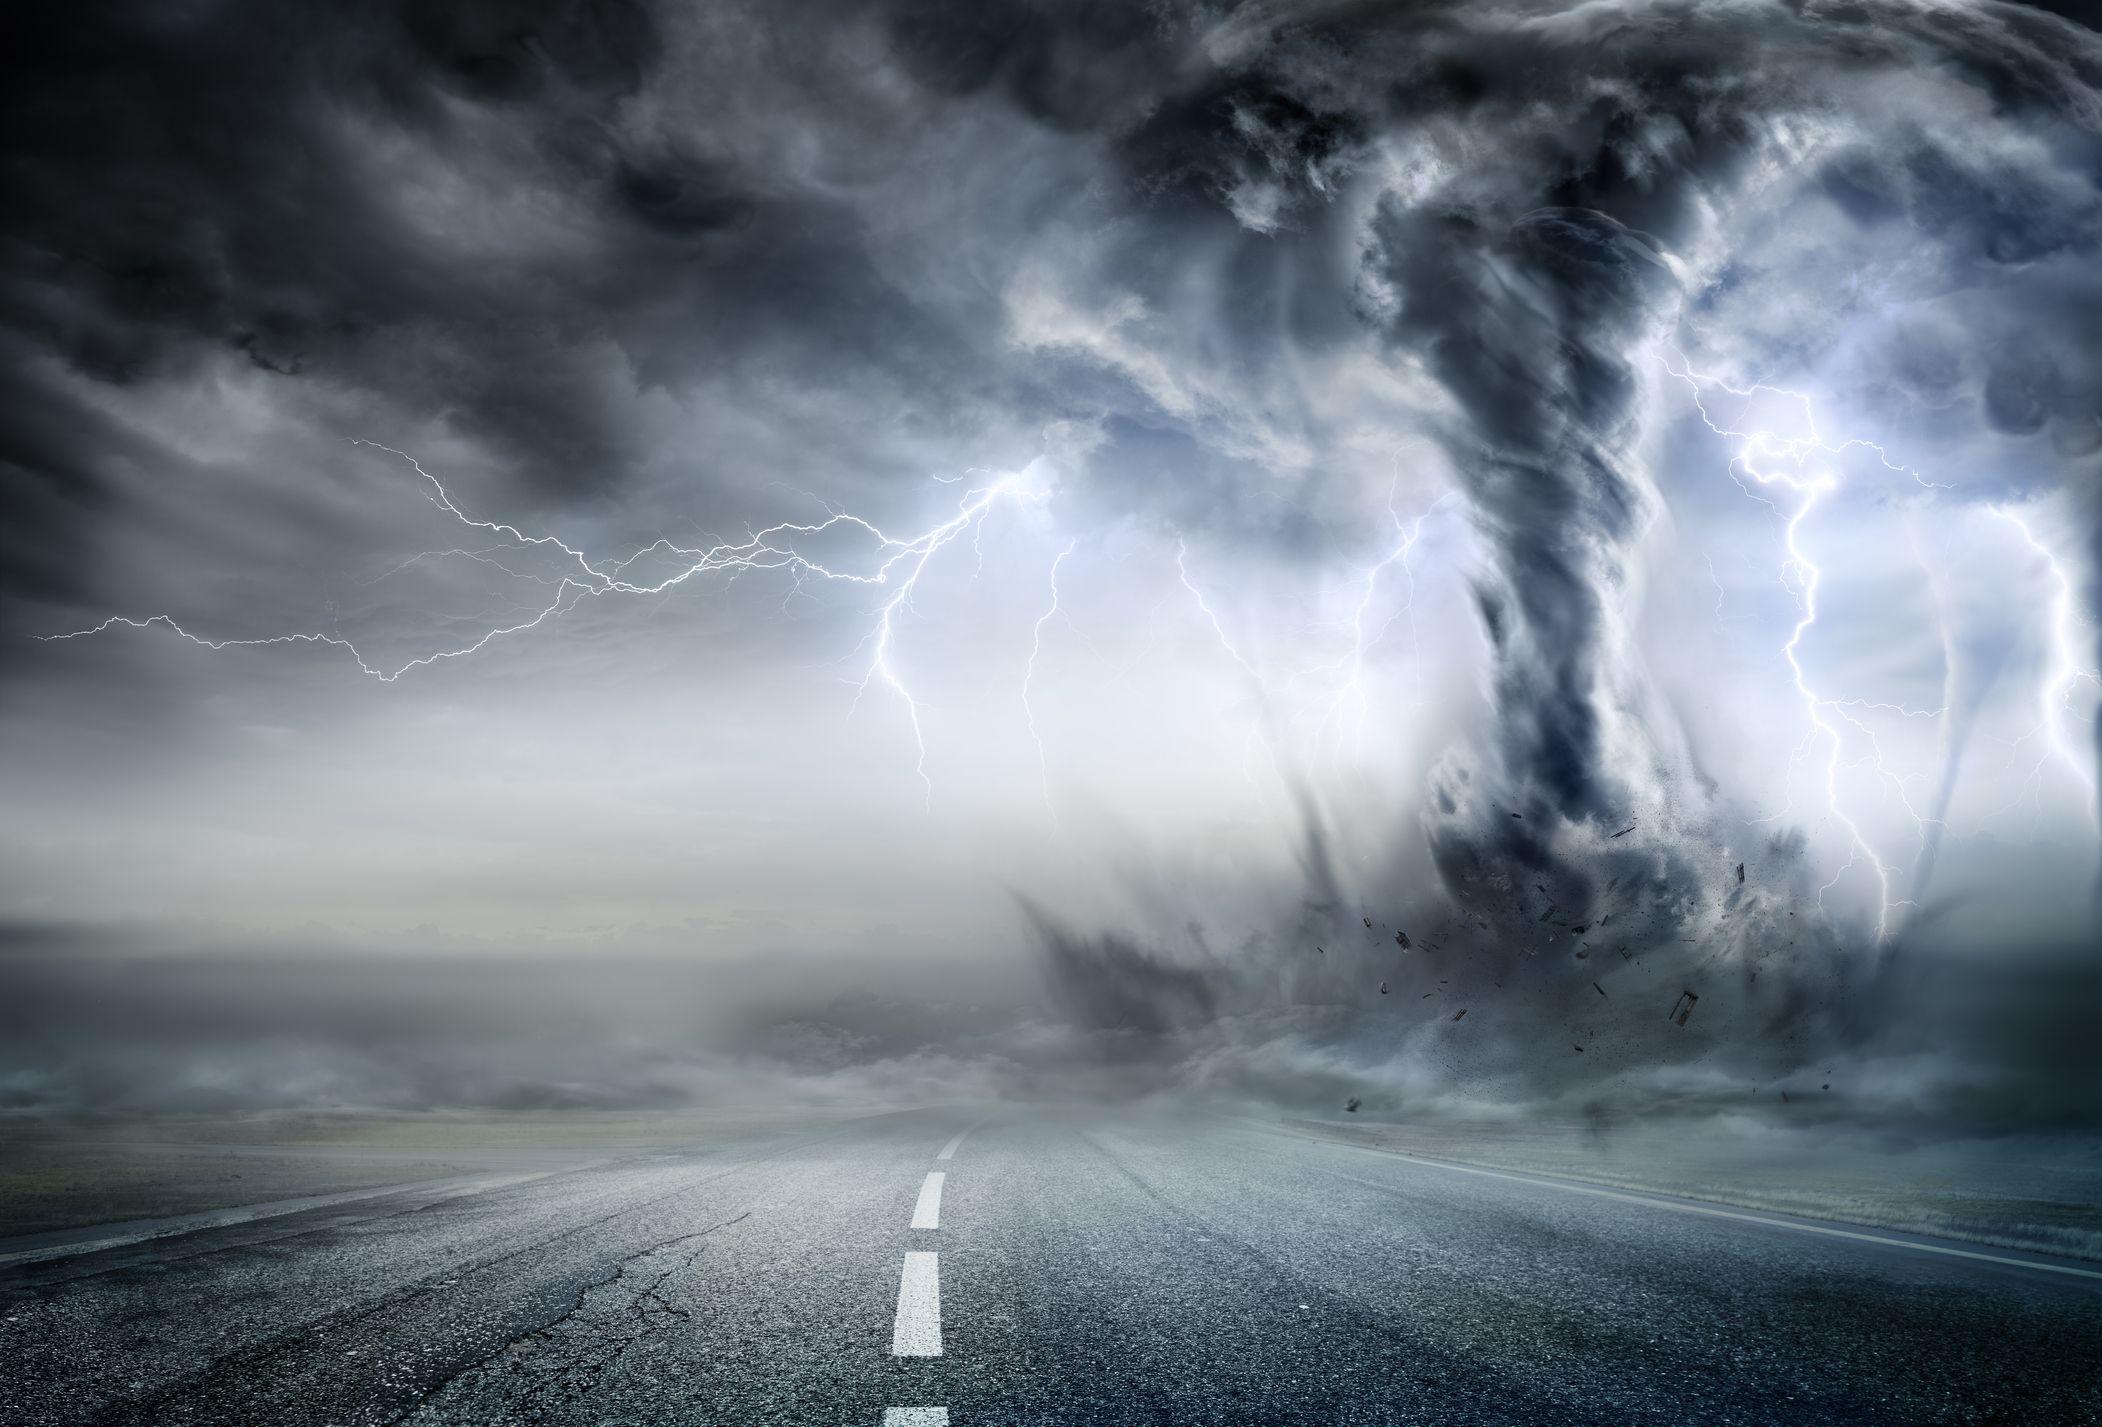 Missouri Tornadoes Last Night: Images Show Devastation in